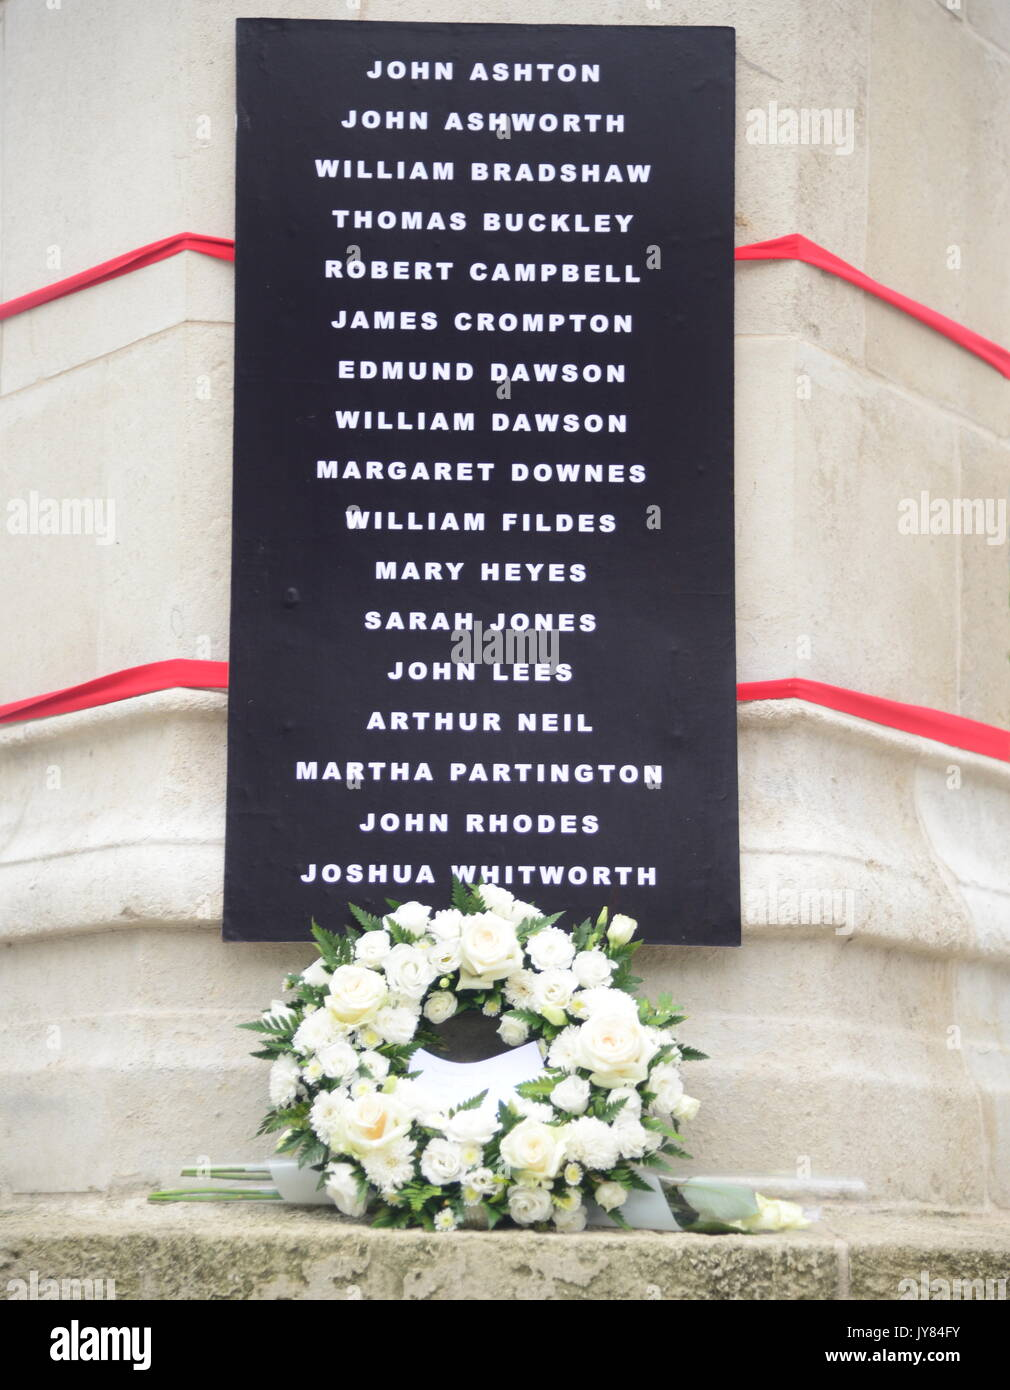 Peterloo memorial flowers and names Stock Photo